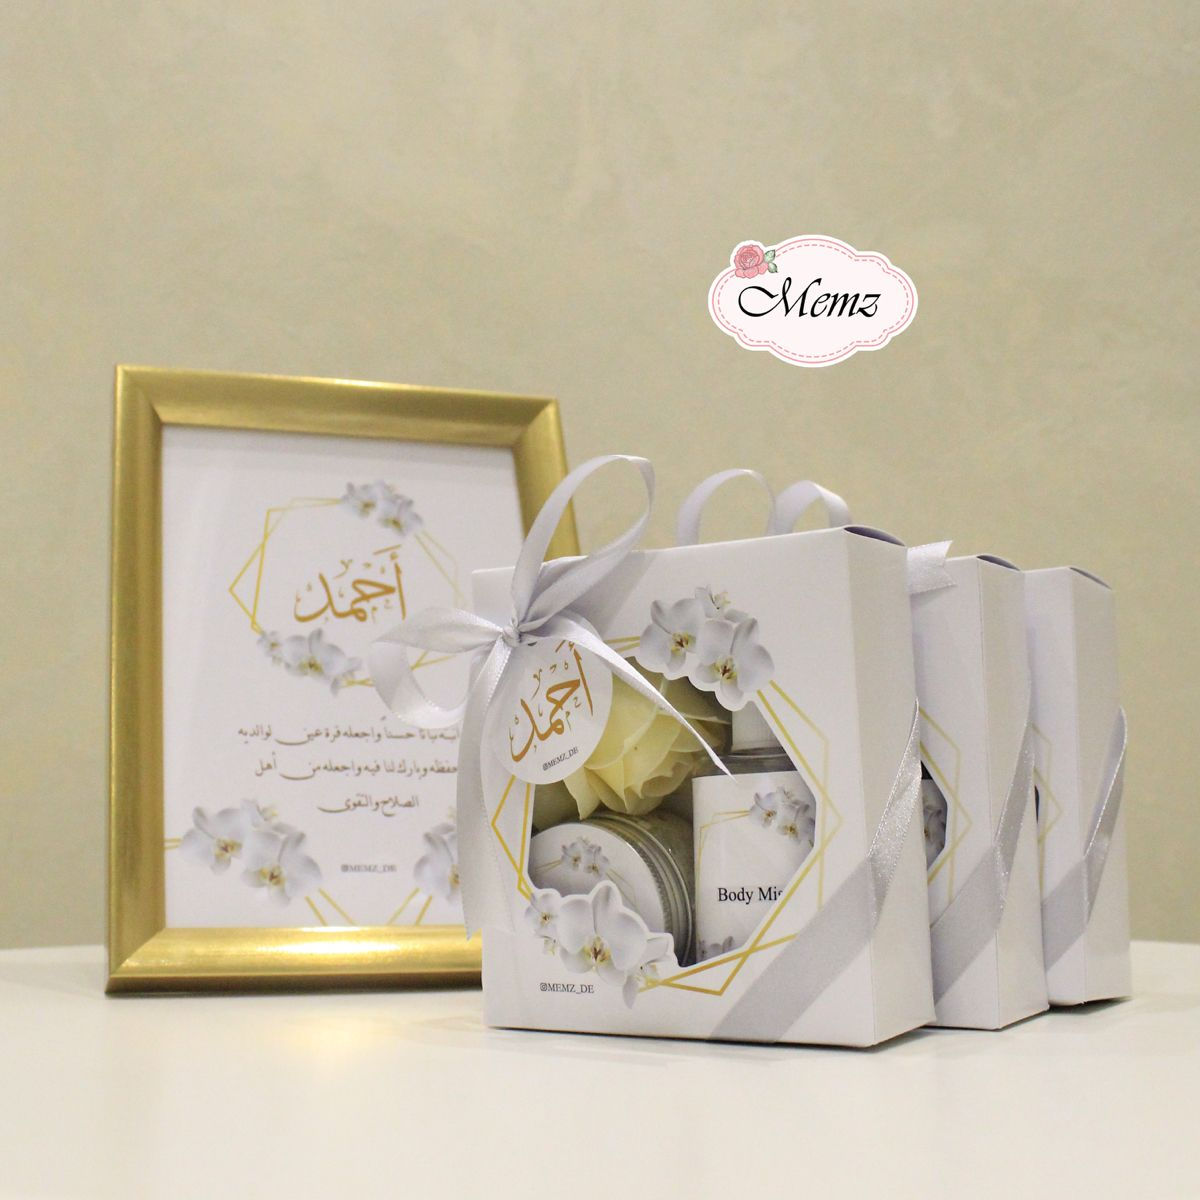 توزيعه بوكس الروز والعطر والسكراب Box Template Baby Cards Projects To Try